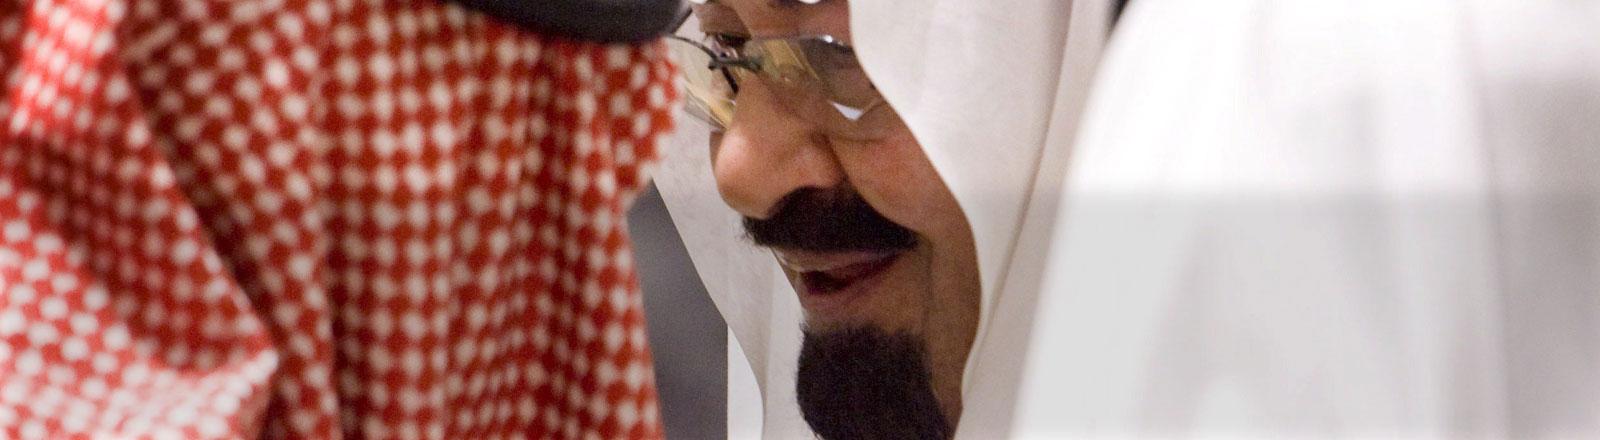 König Abdullah von Saudi-Arabien.